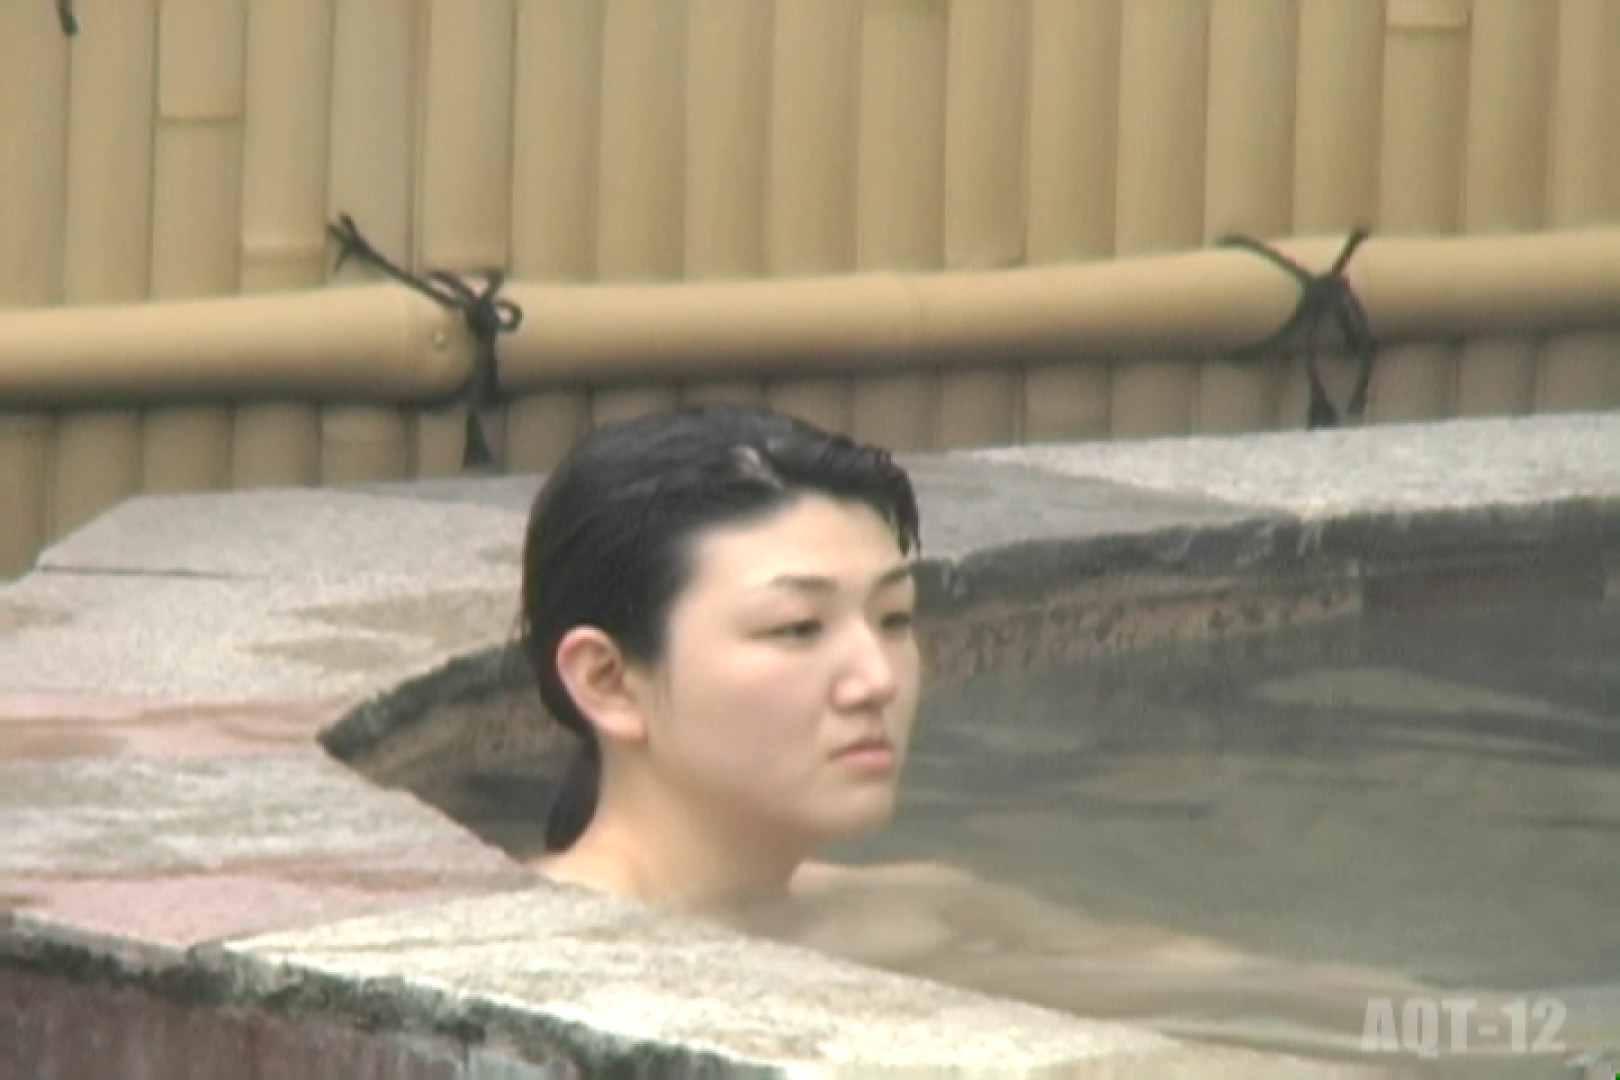 Aquaな露天風呂Vol.810 露天   OLセックス  58画像 16